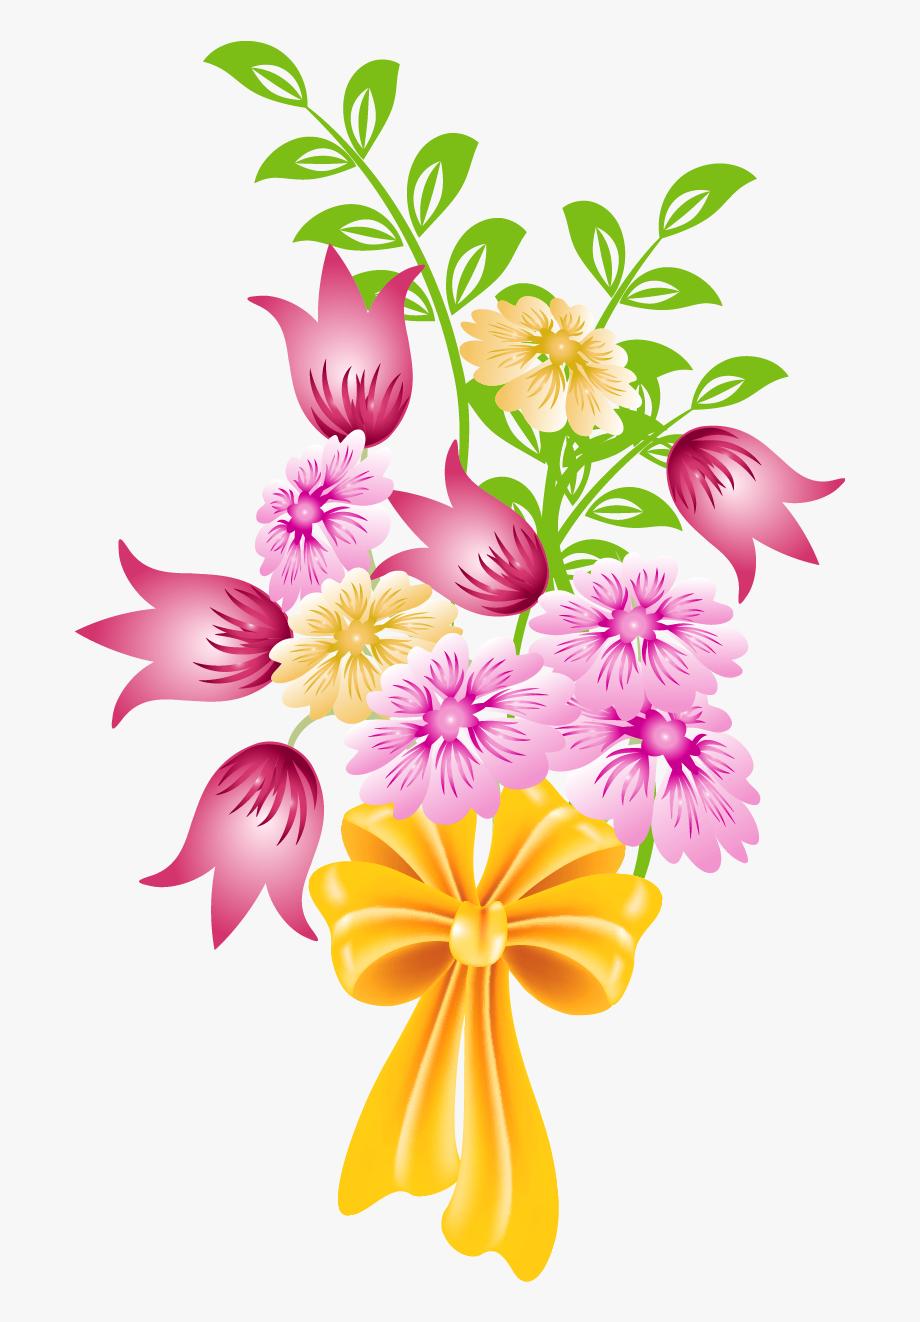 Bouquet clipart cartoon. Floral bunch flower png